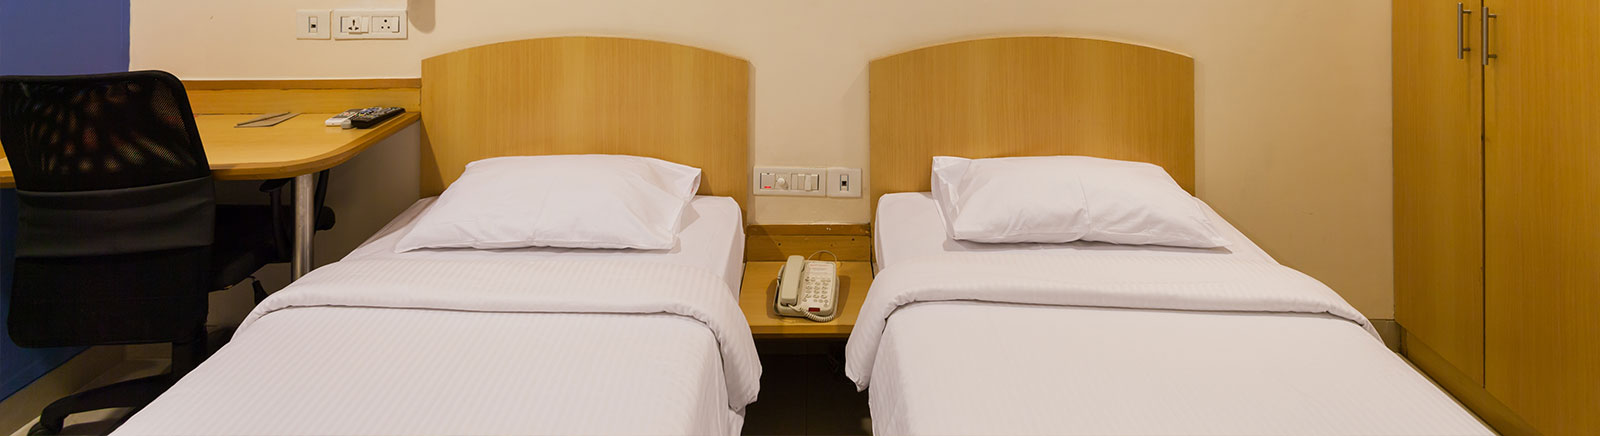 Ginger Nashik Hotel Rooms